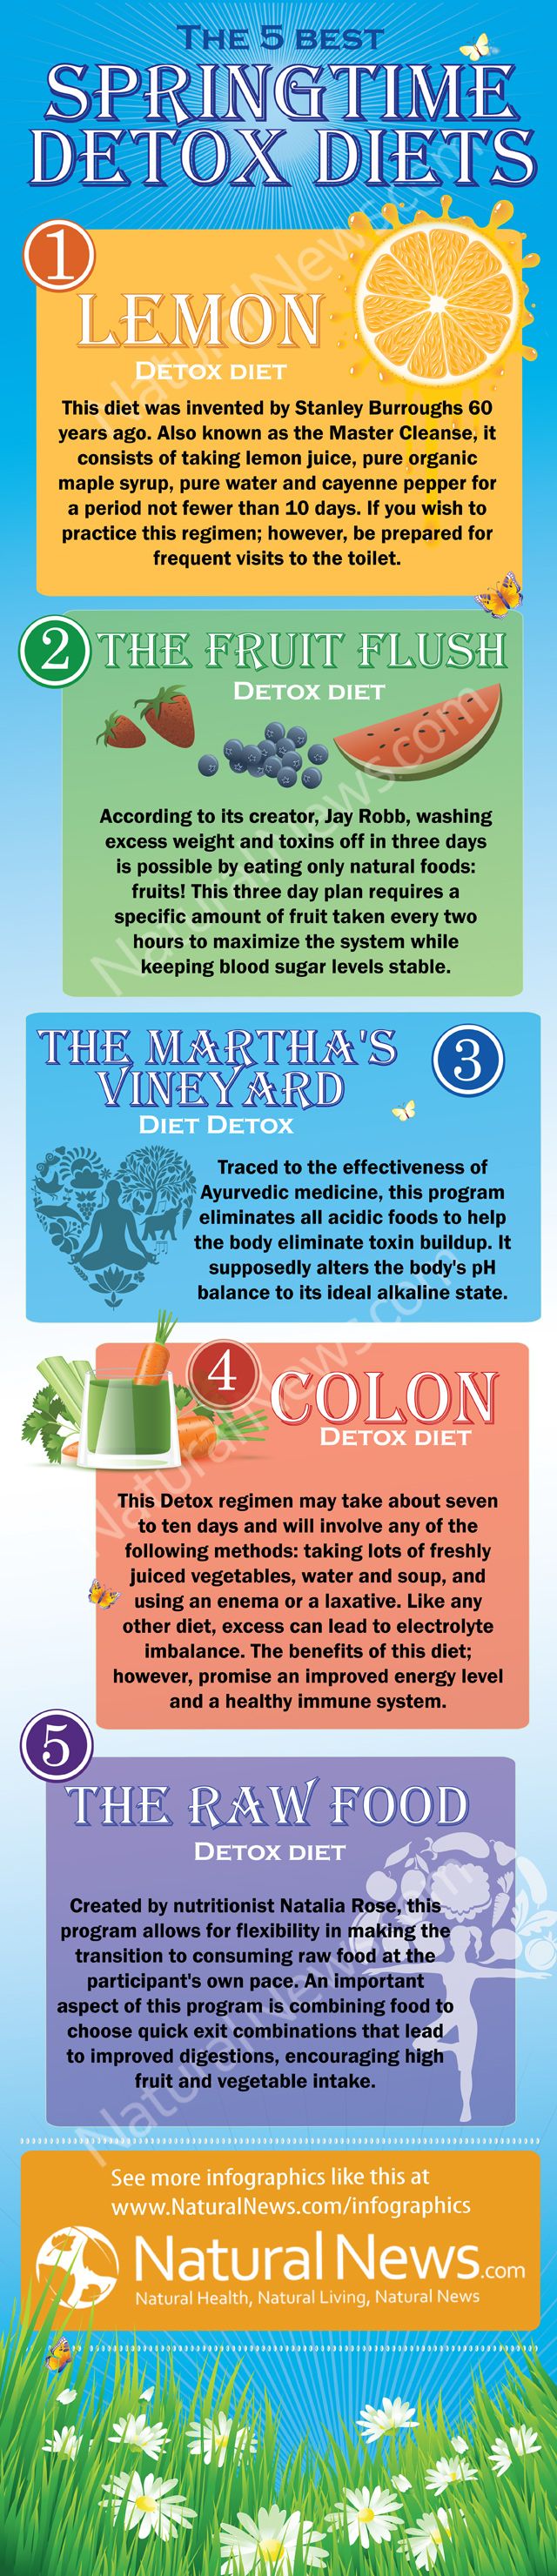 The 5 Best Detox Diets